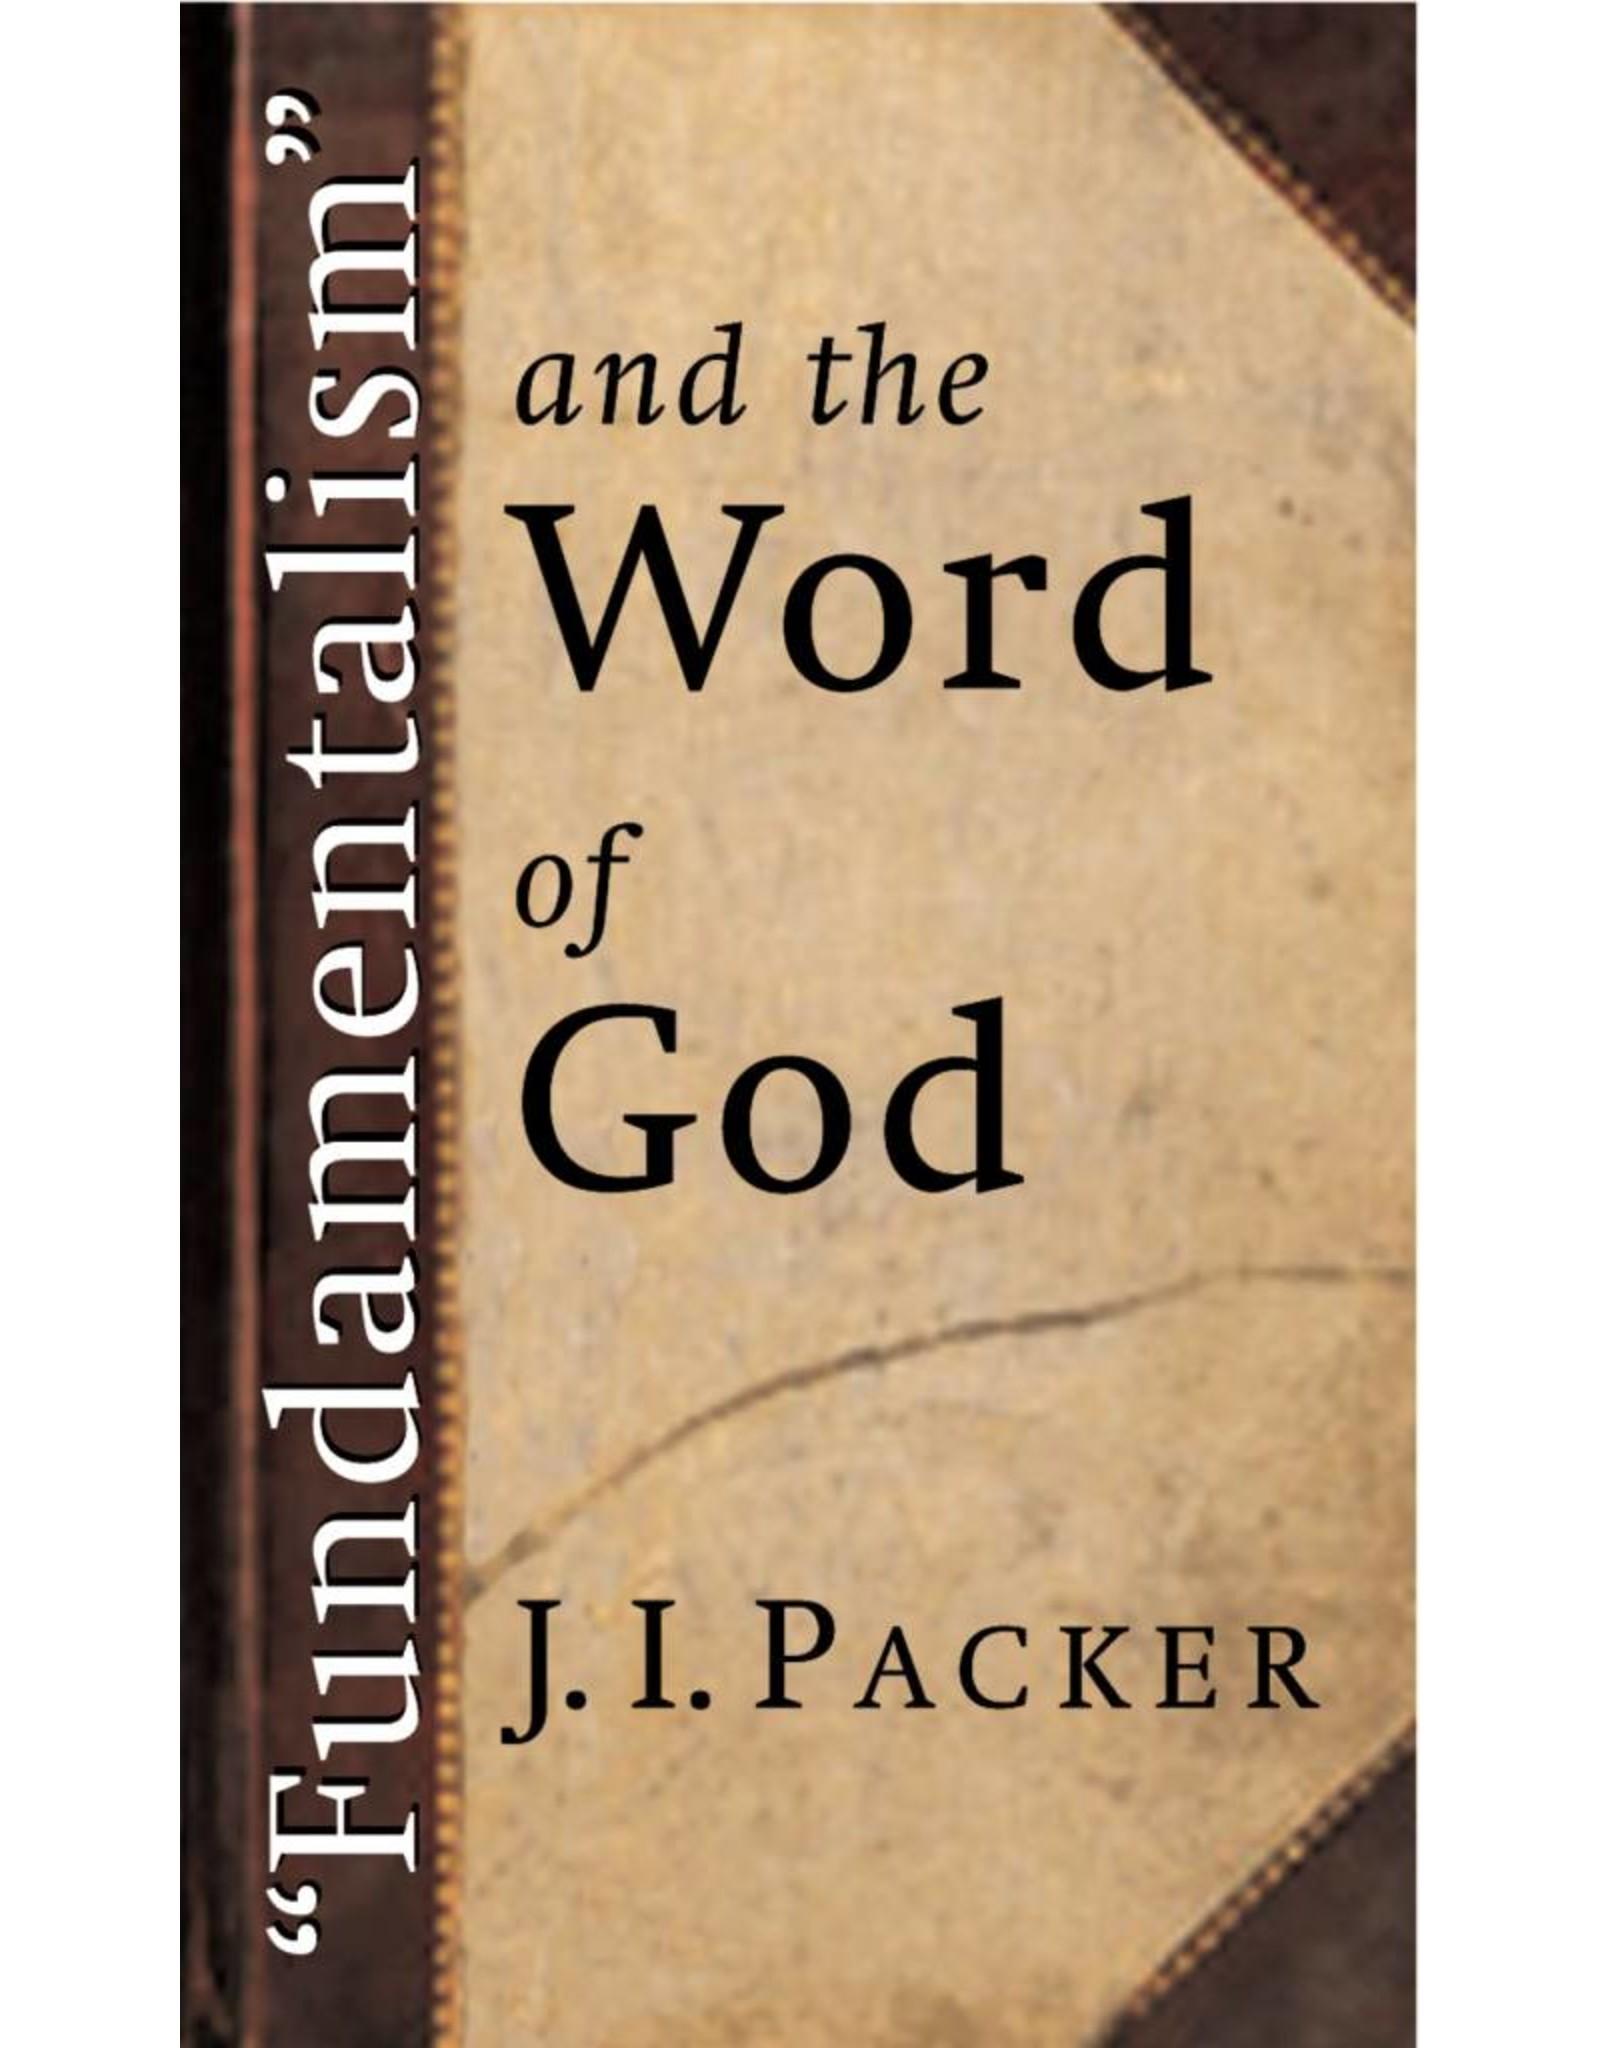 Wm. B. Eerdmans Fundamentalism and the Word of God